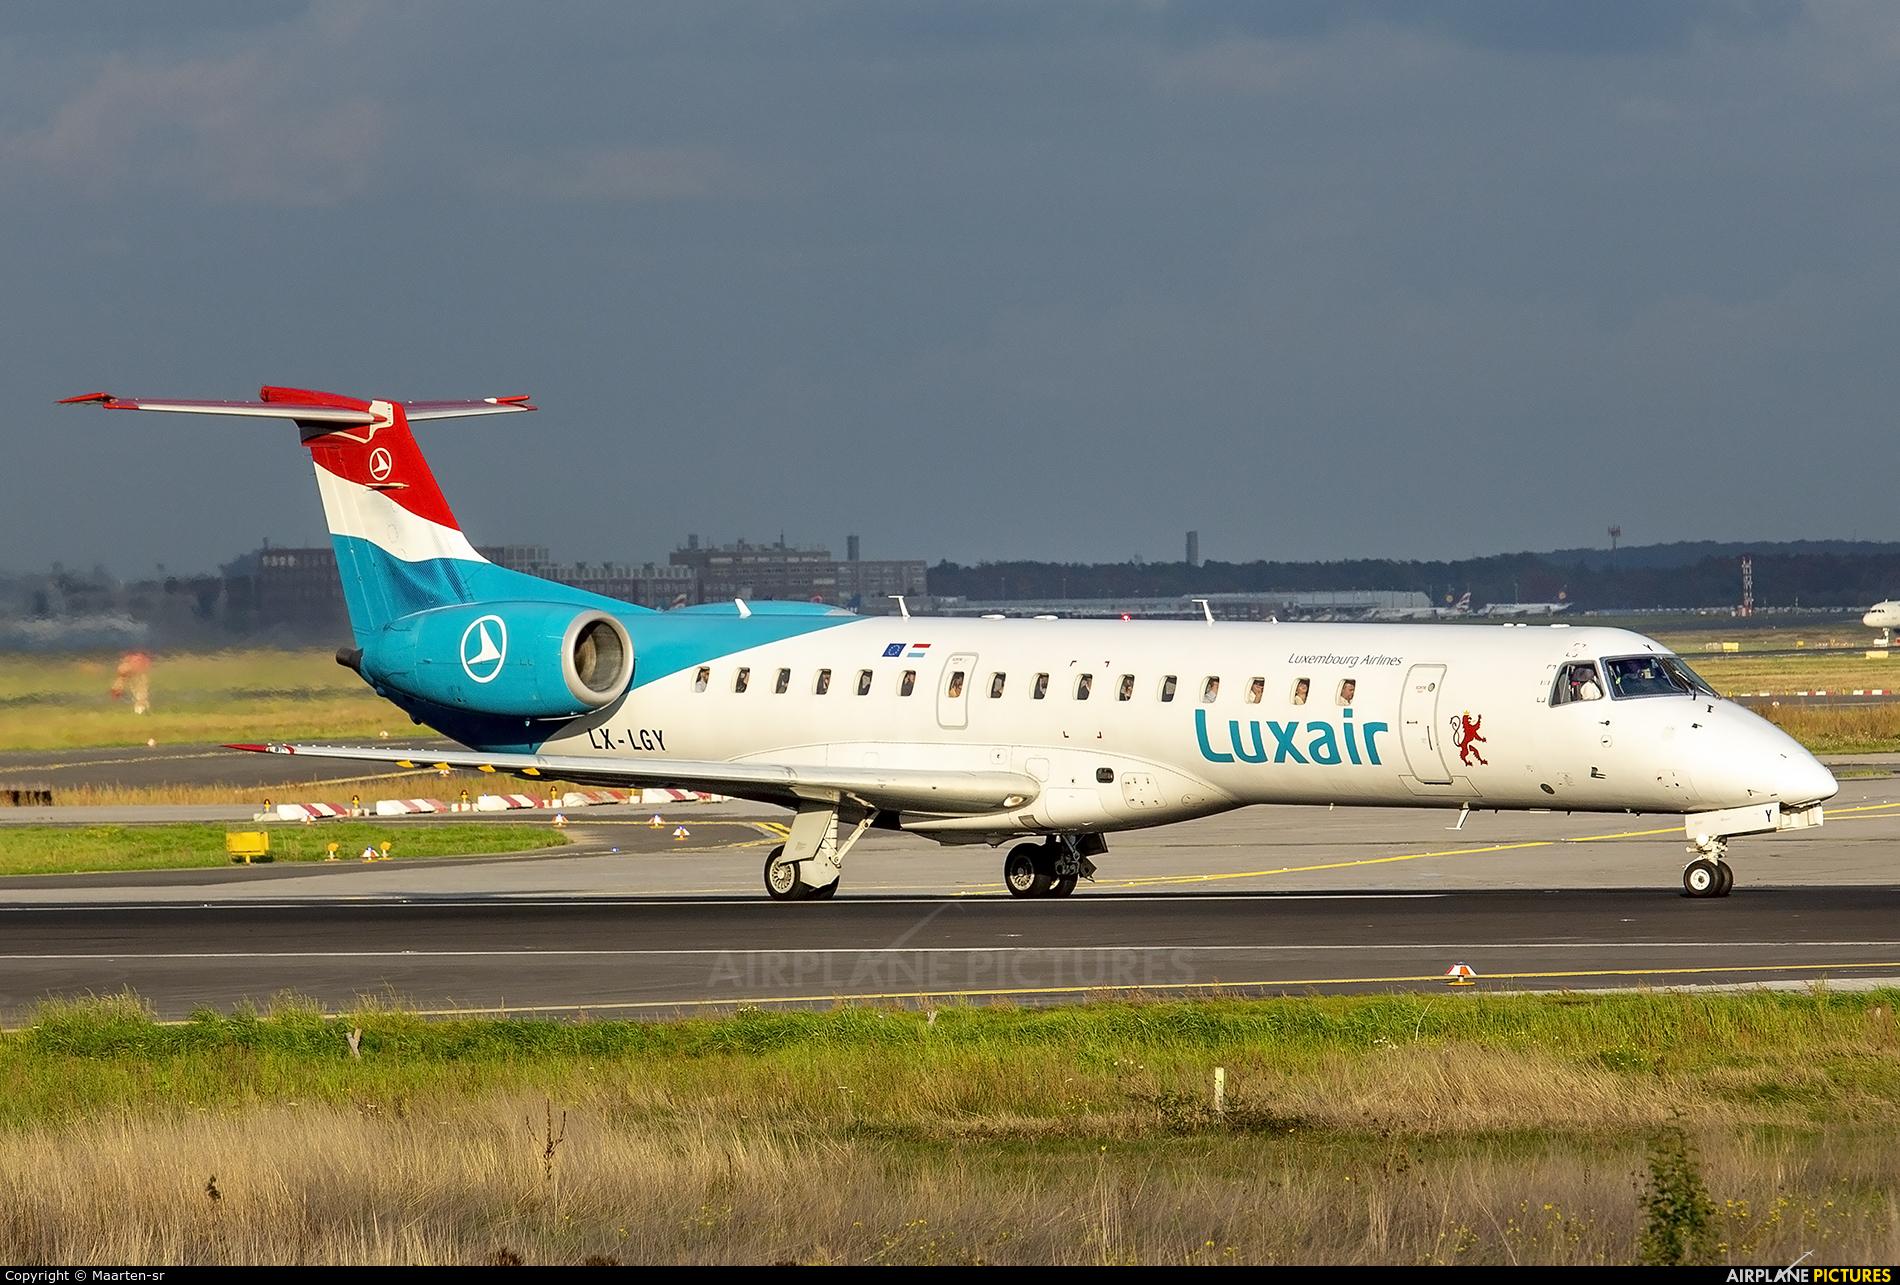 Luxair LX-LGY aircraft at Frankfurt